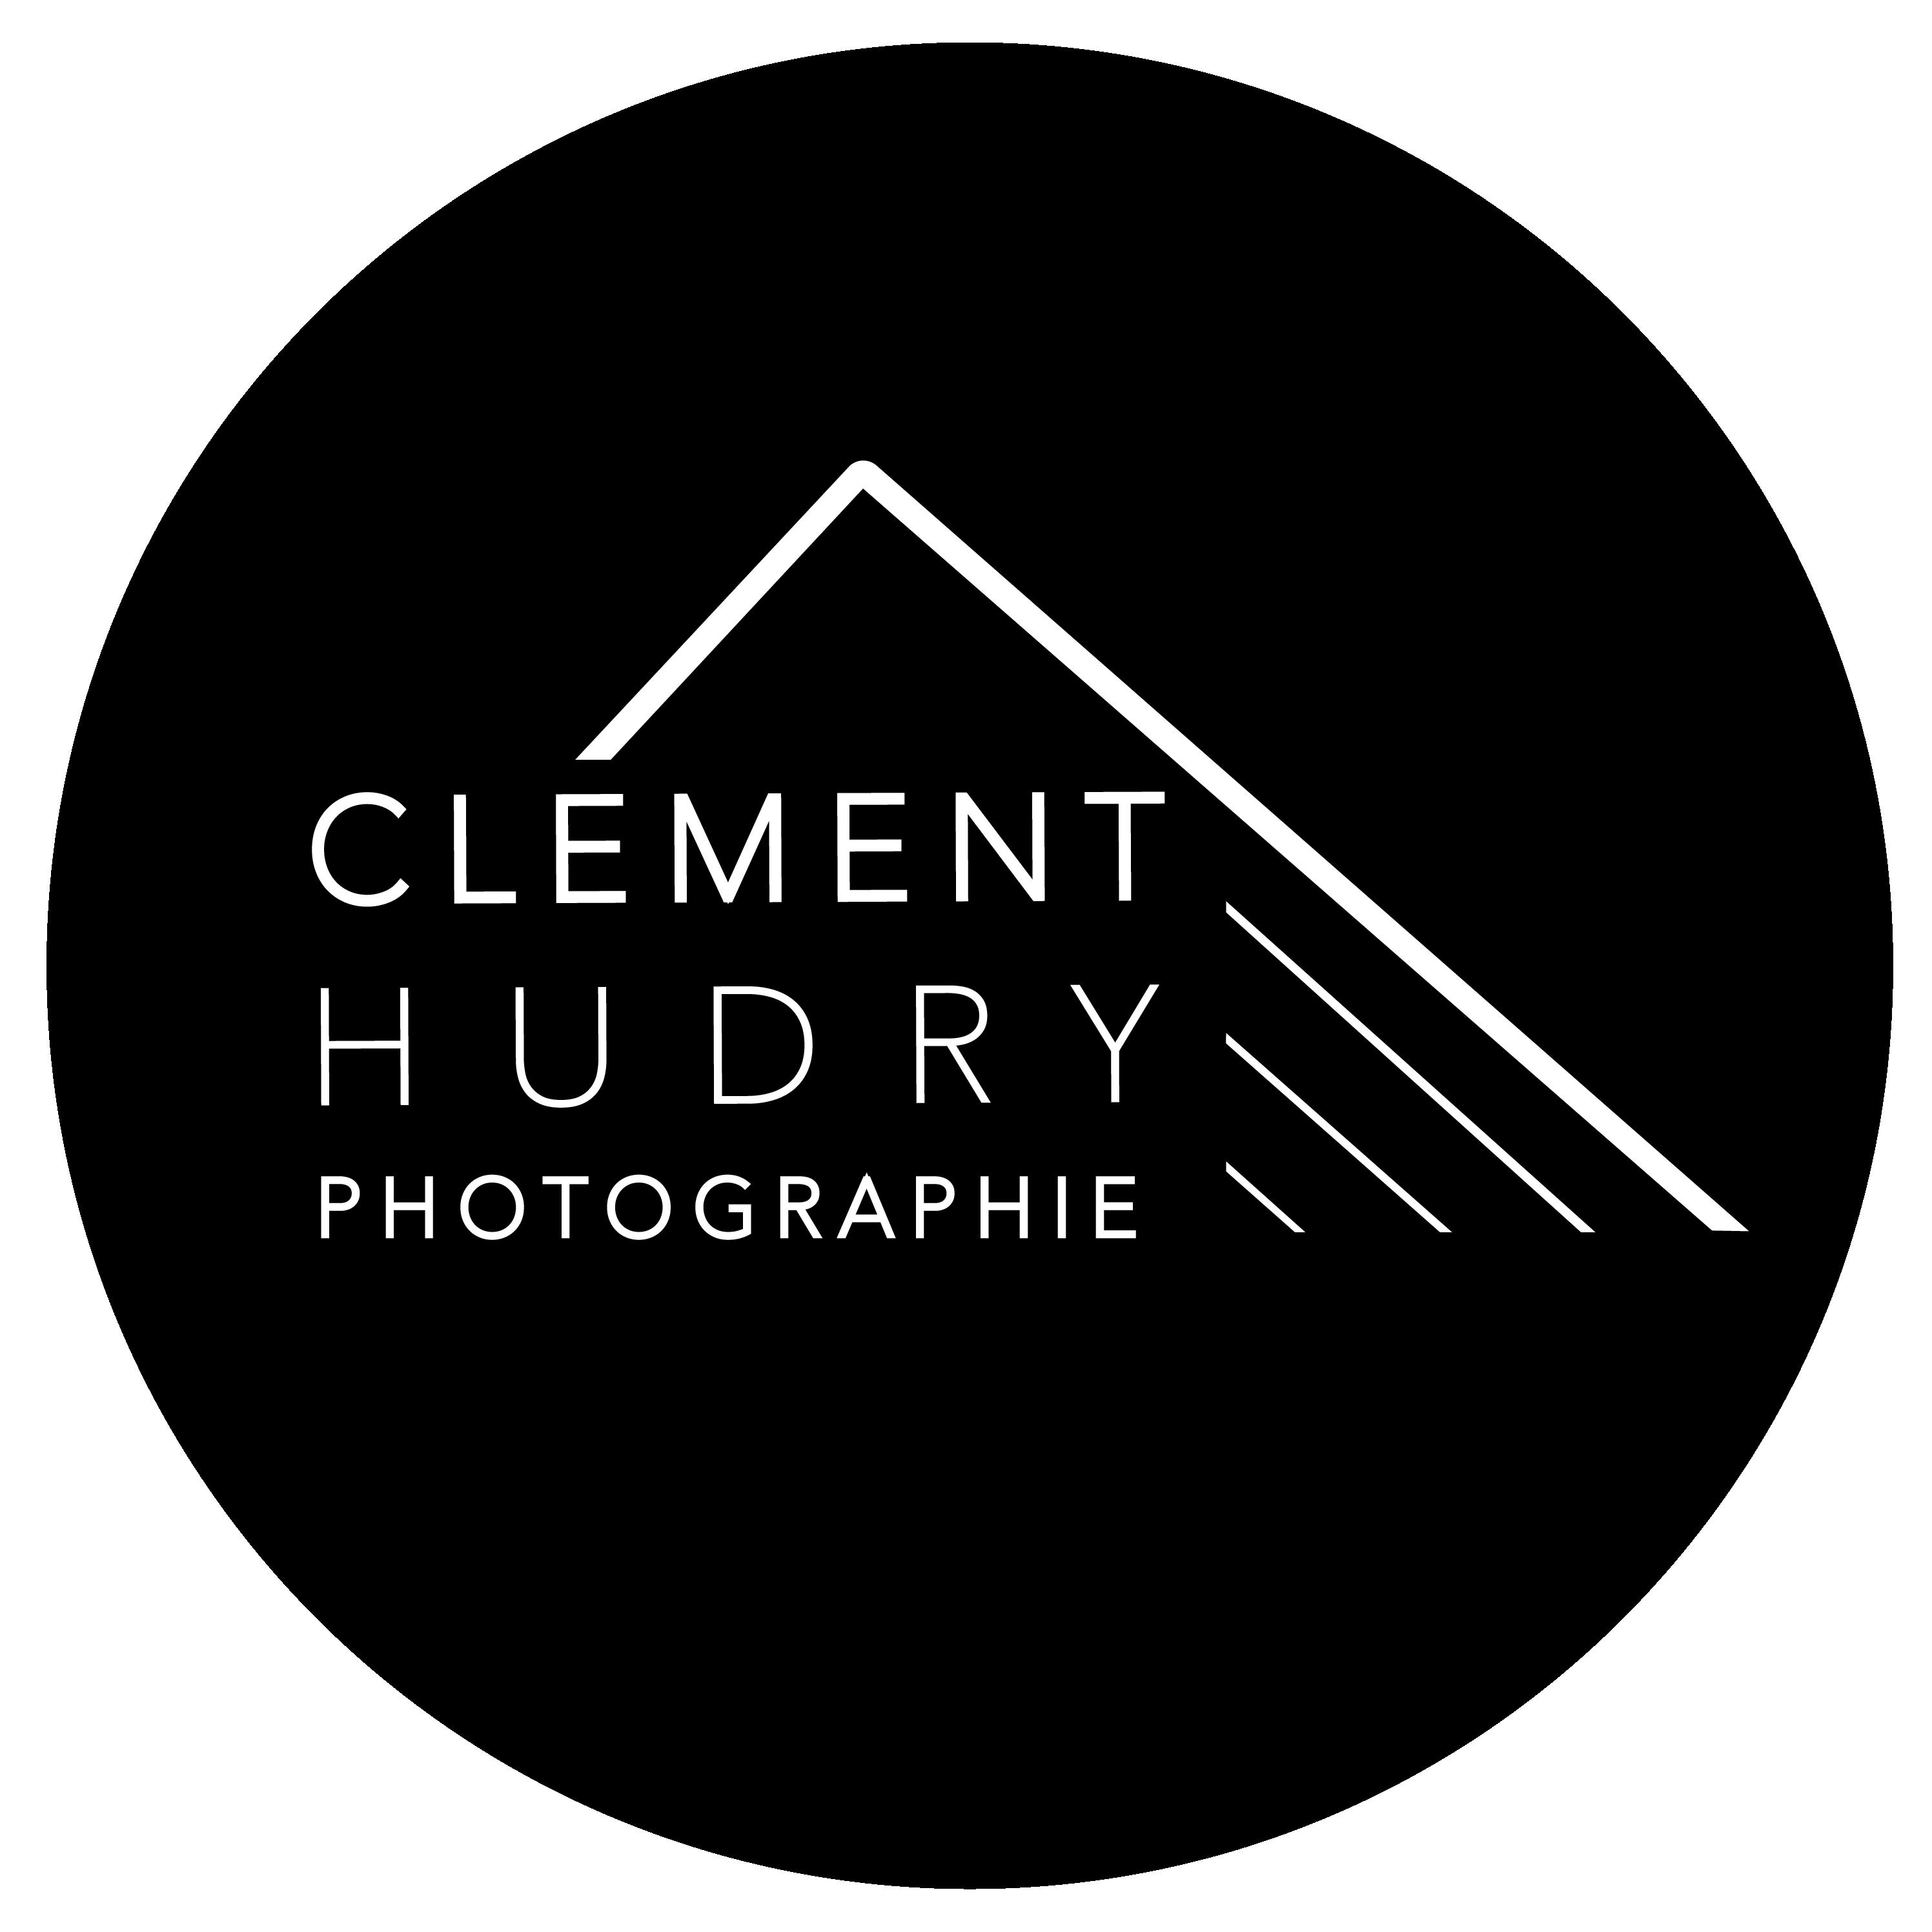 Clément Hudry